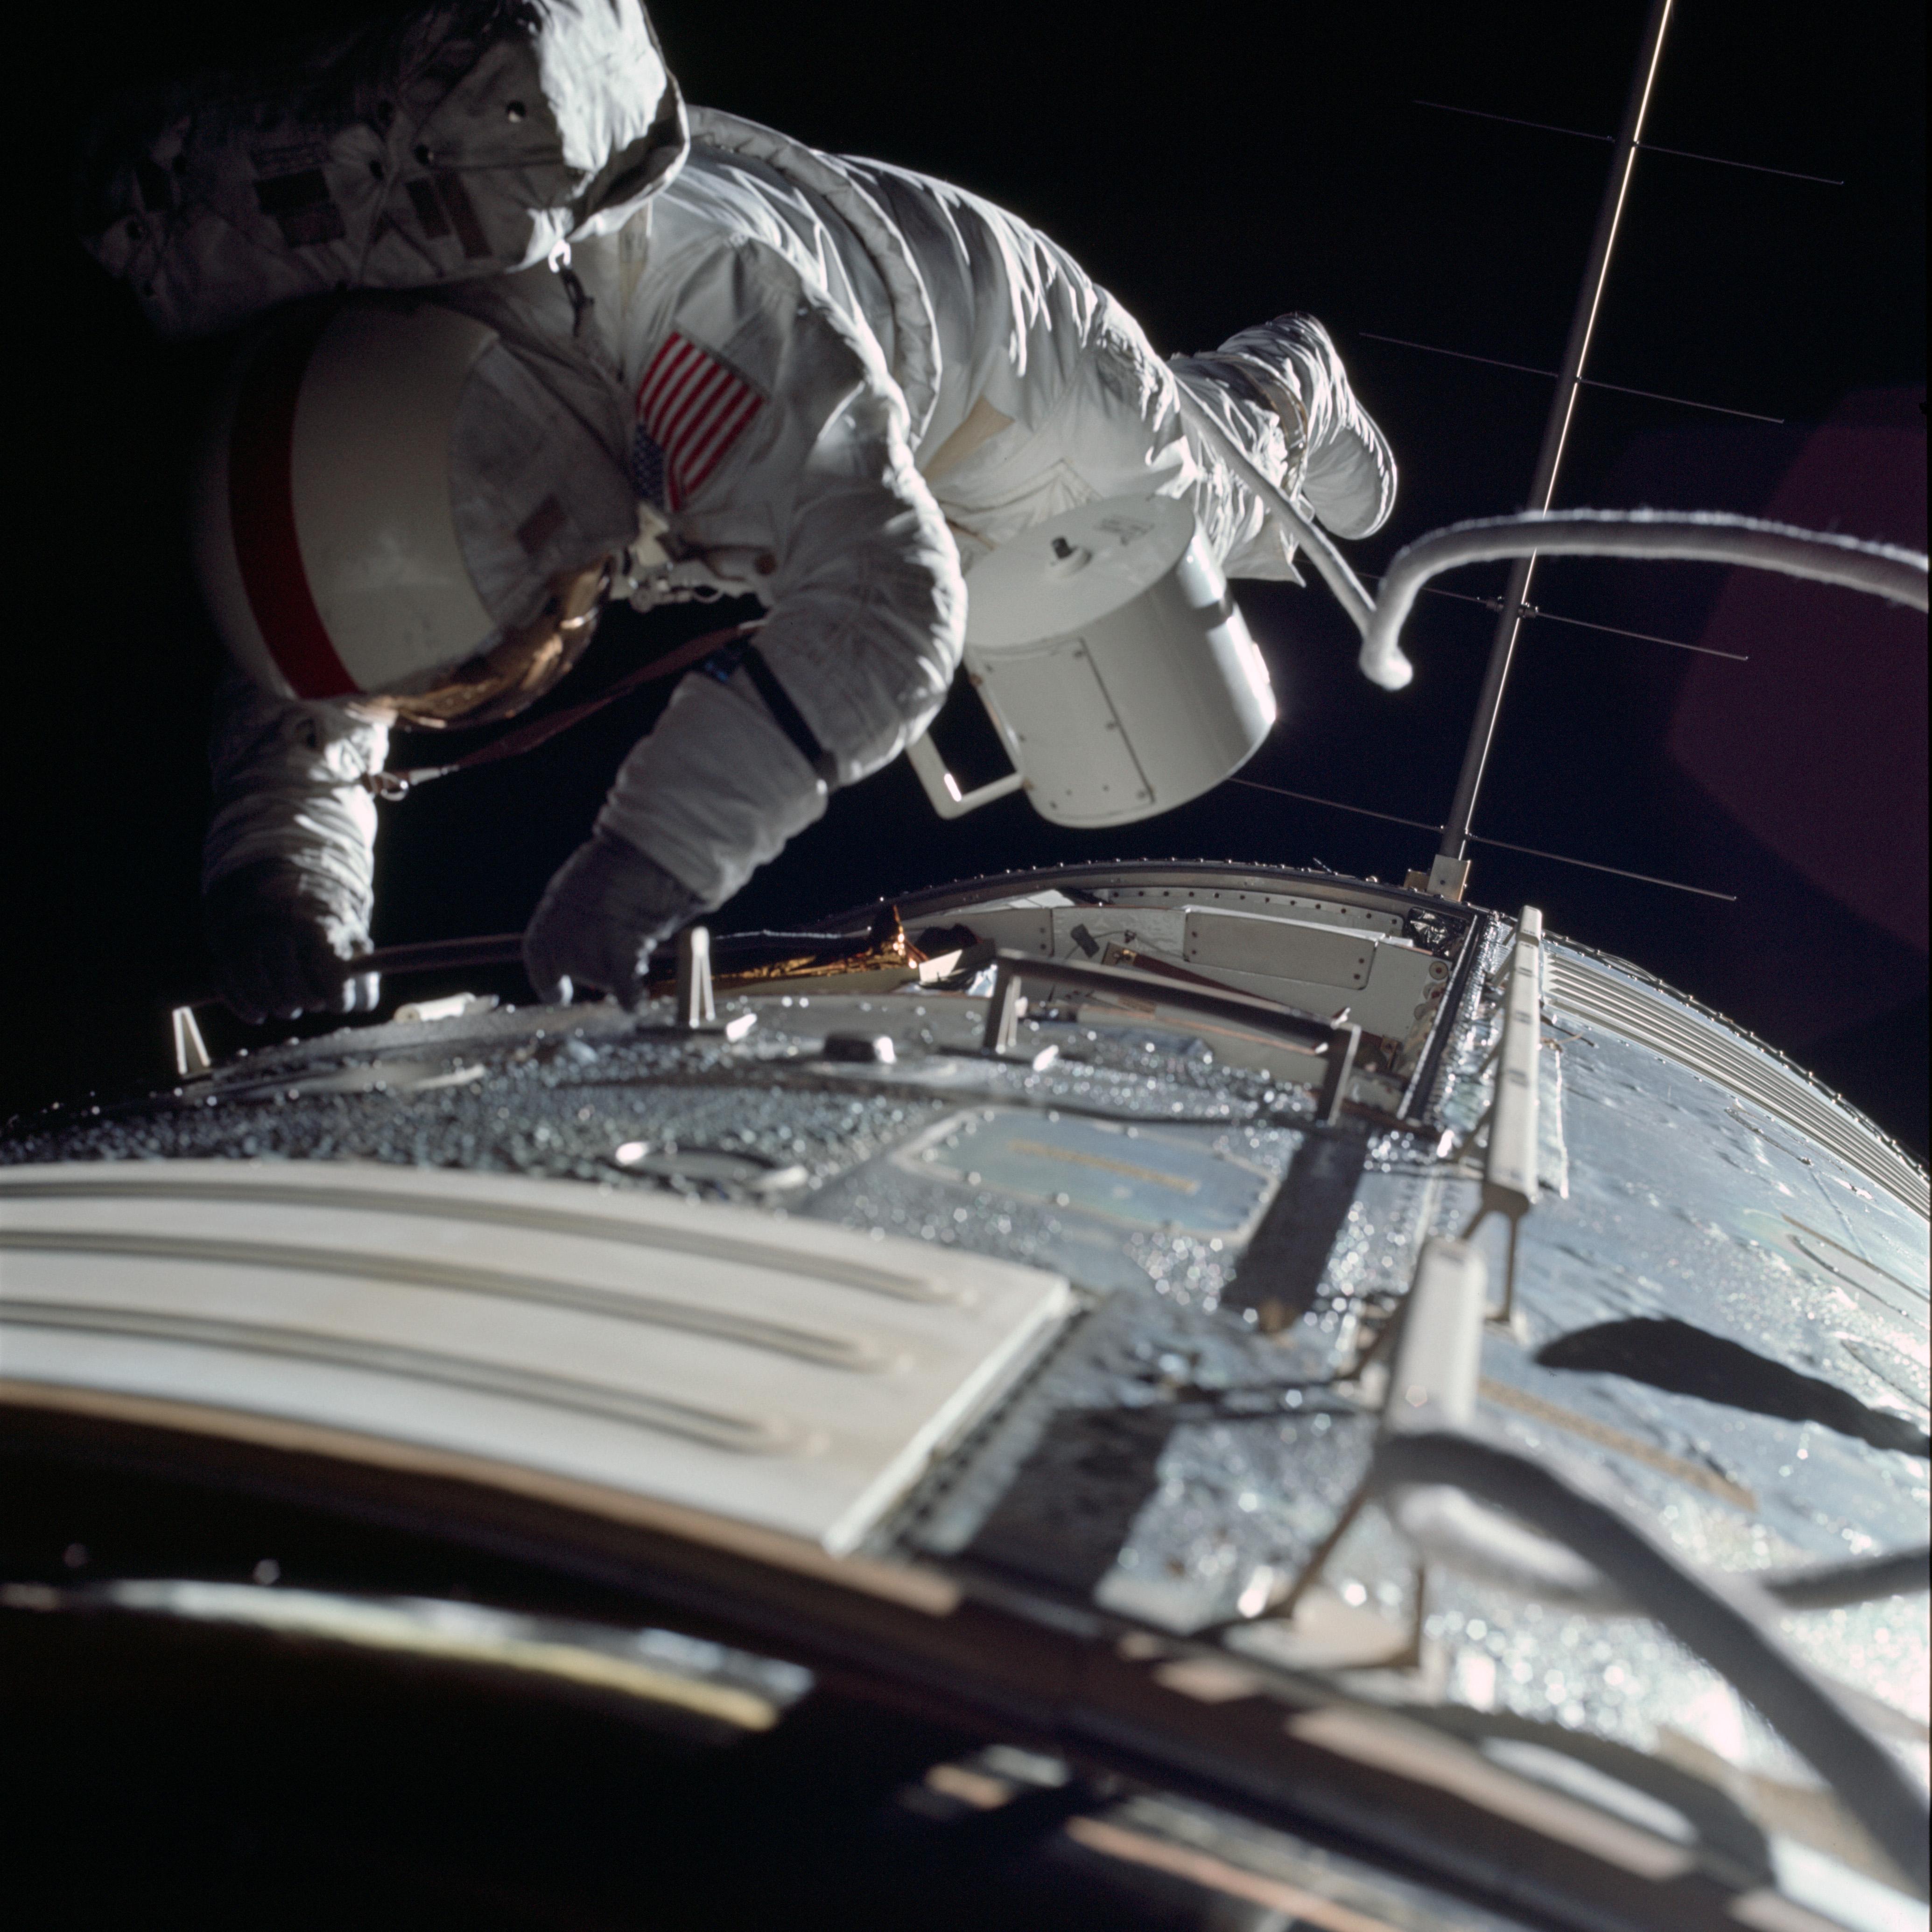 Apollo_17_astronaut_Ronald_E._Evans_performs_an_EVA_to_retrieve_film_cassettes_during_the_trans-Earth_coast